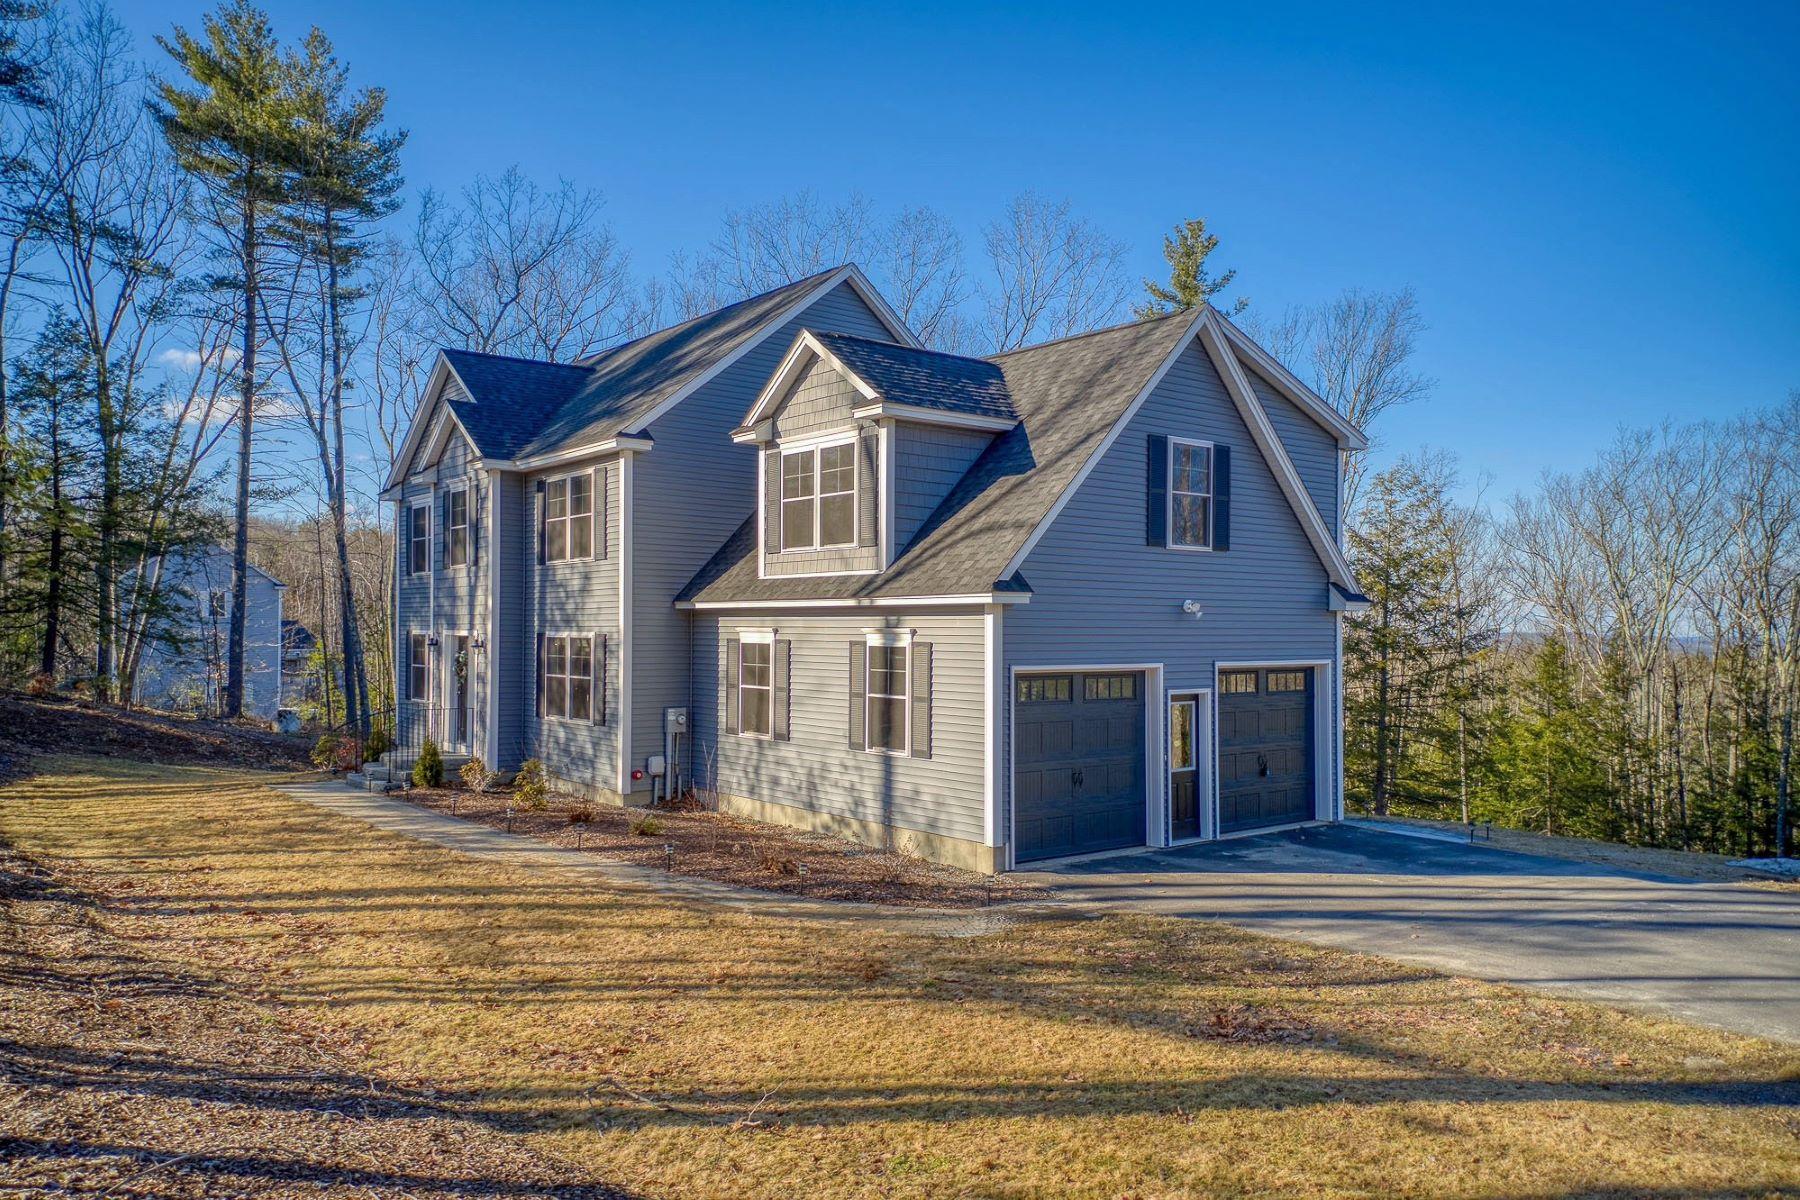 Single Family Homes for Sale at 145 Joe English Road New Boston, New Hampshire 03070 United States